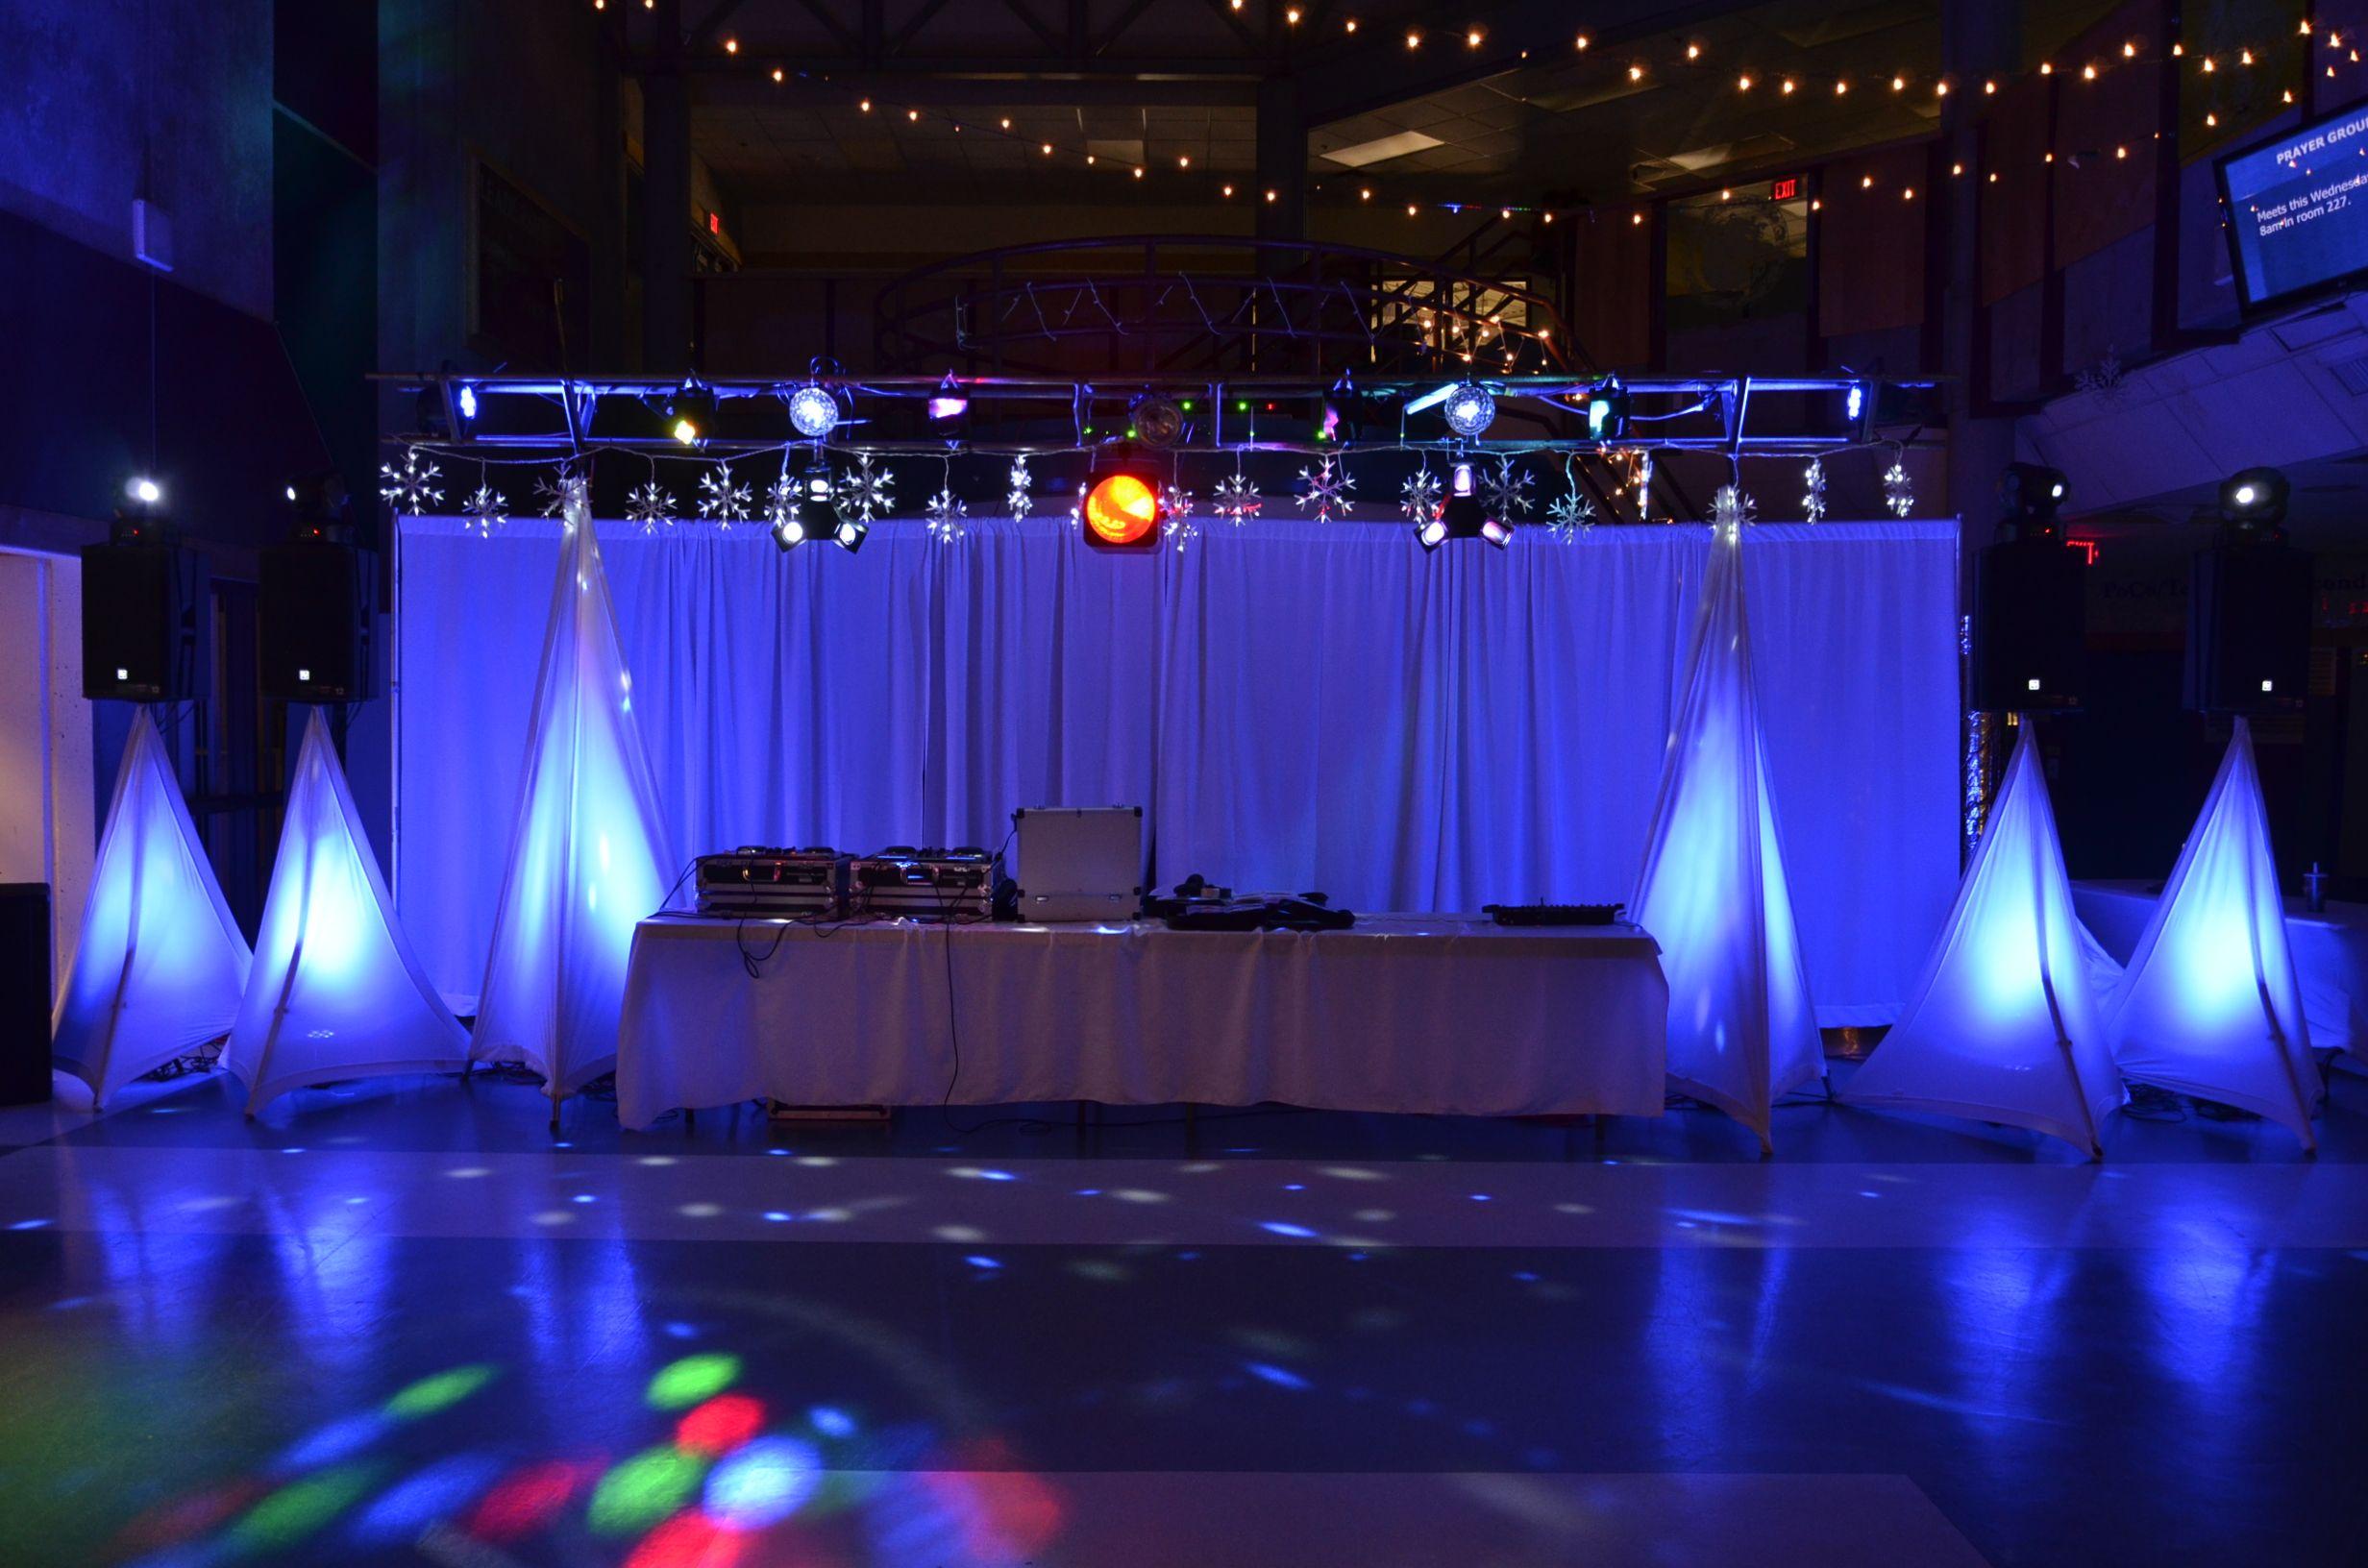 Wedding DJ Vancouver, Vancouver DJ Services, DJ Vancouver, Events Lighting, Up lighting, Uplighting, Lighting Rental